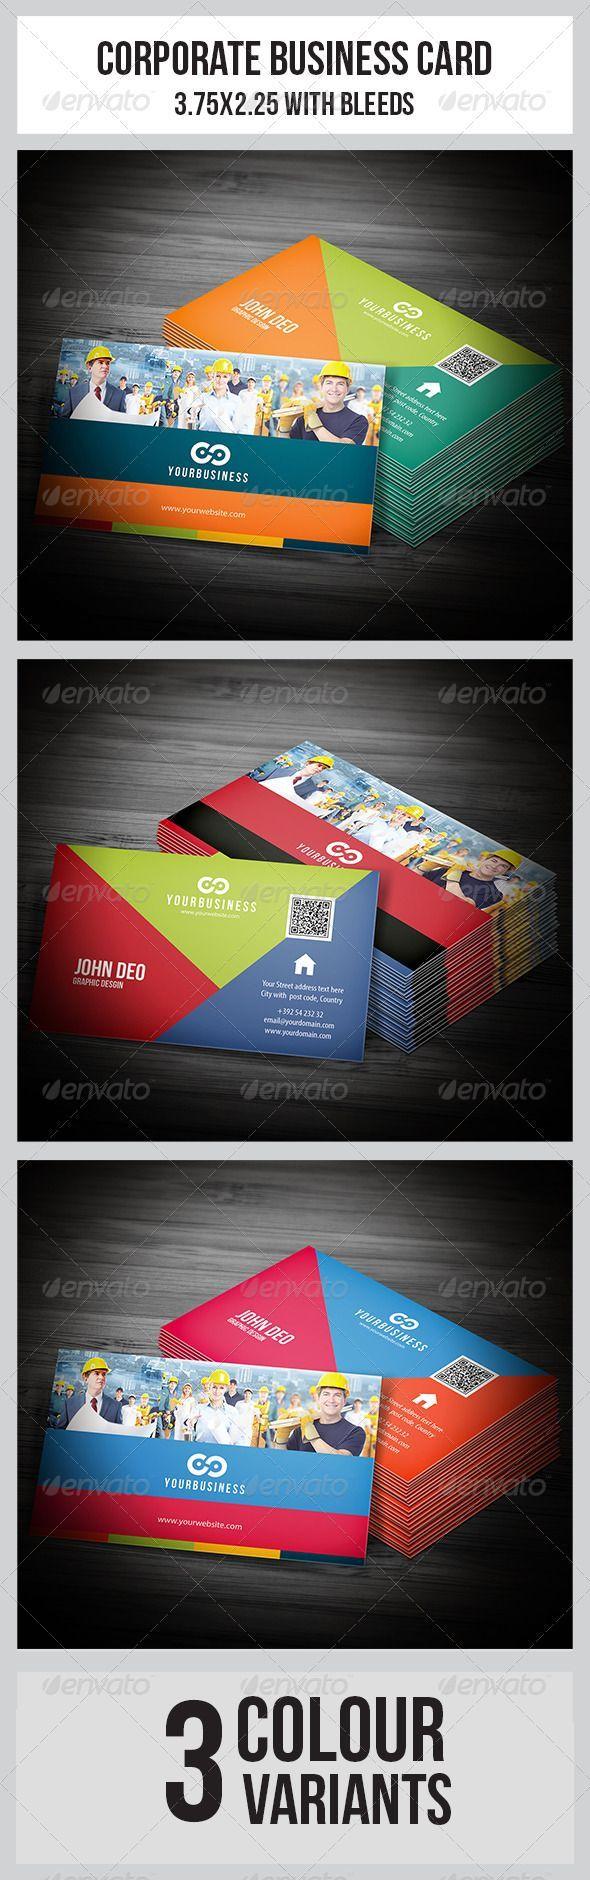 12 best Business Cards images on Pinterest | Carte de visite ...